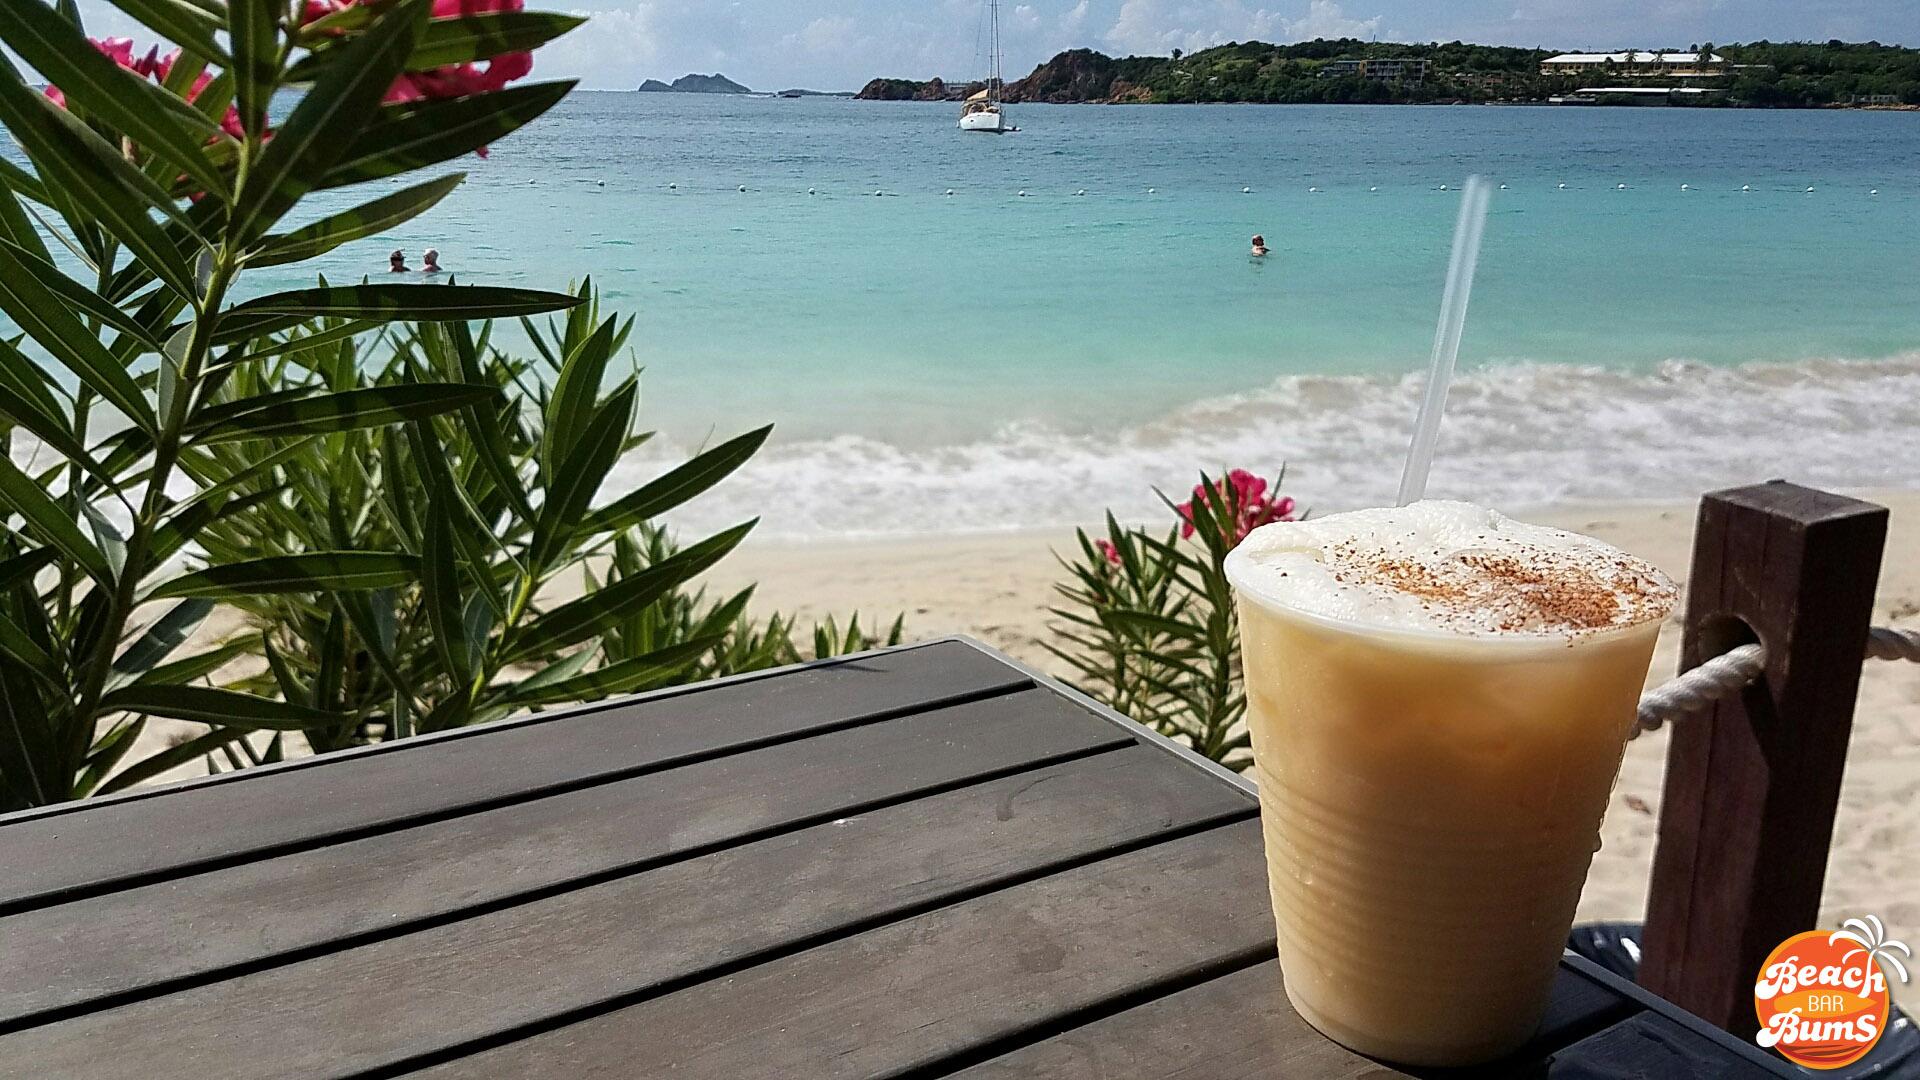 painkiller, caribbean, lindbergh bay, st. thomas, emerald beach resort, usvi, us virgin islands